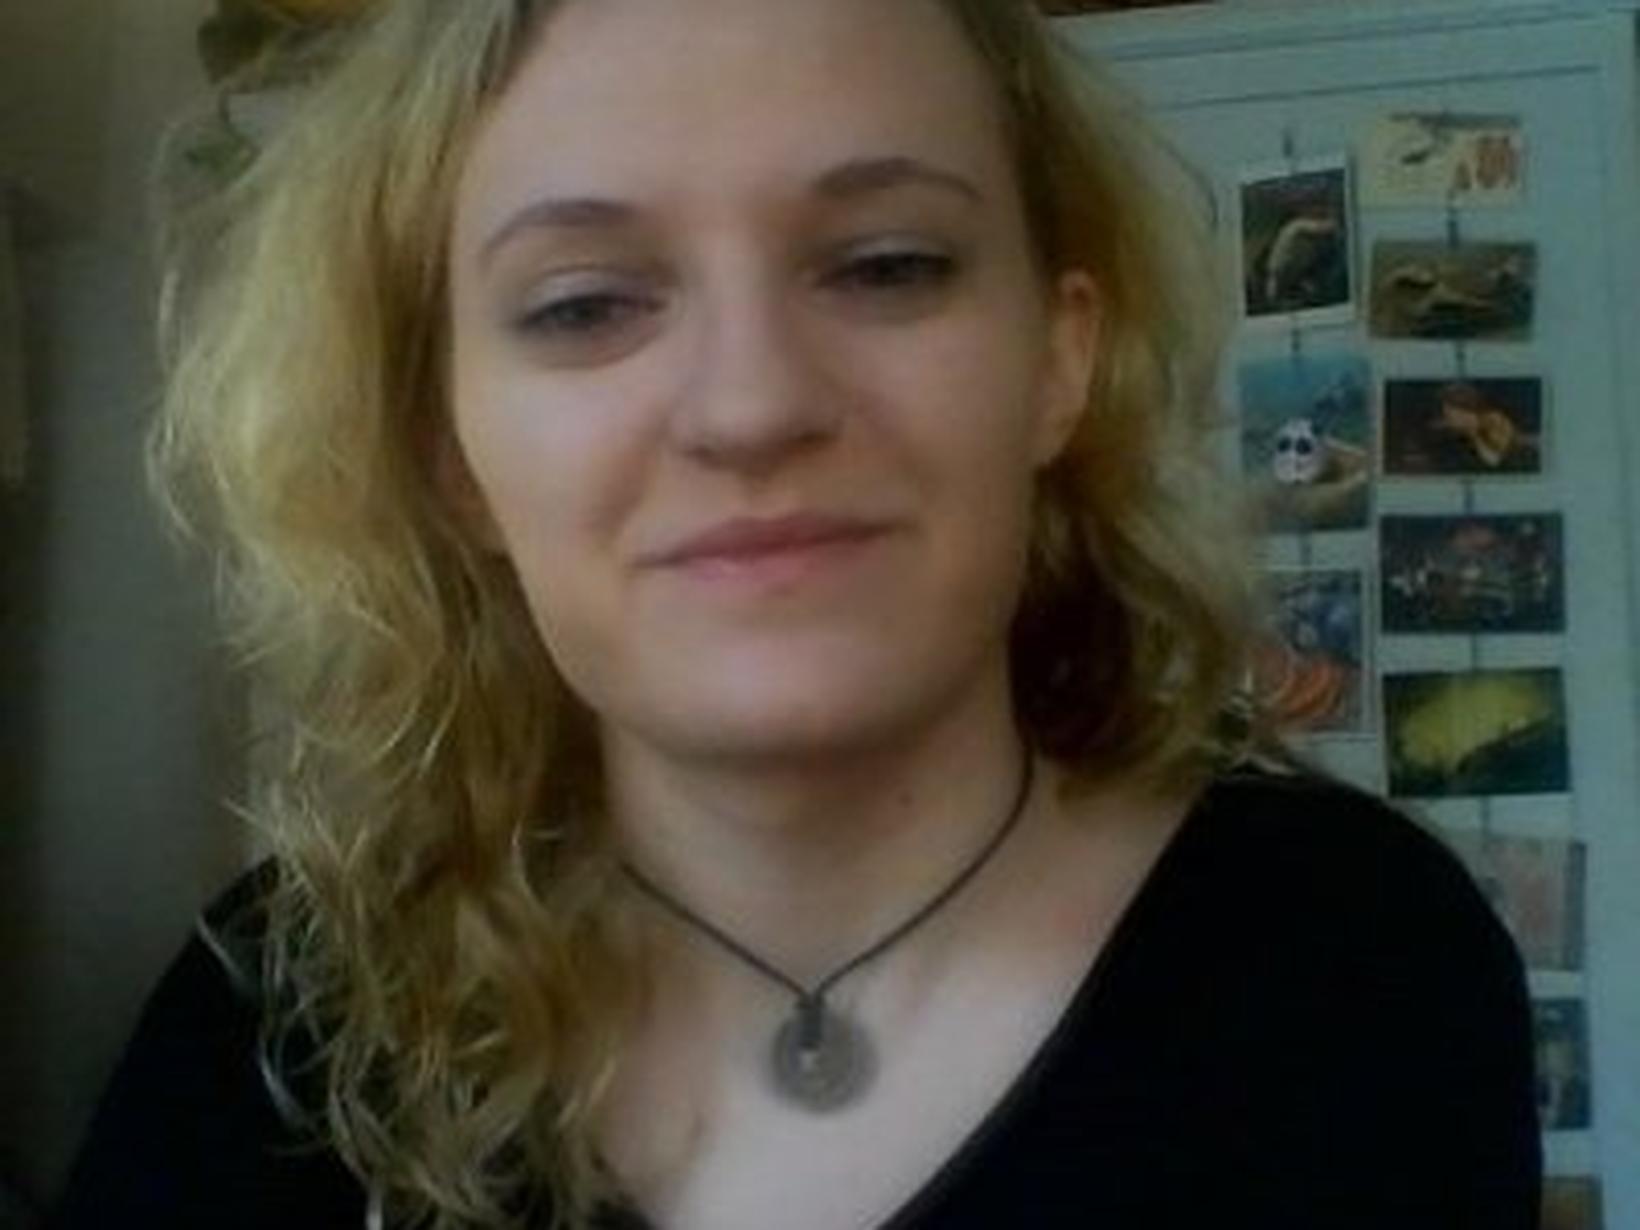 Monika from Oxford, United Kingdom